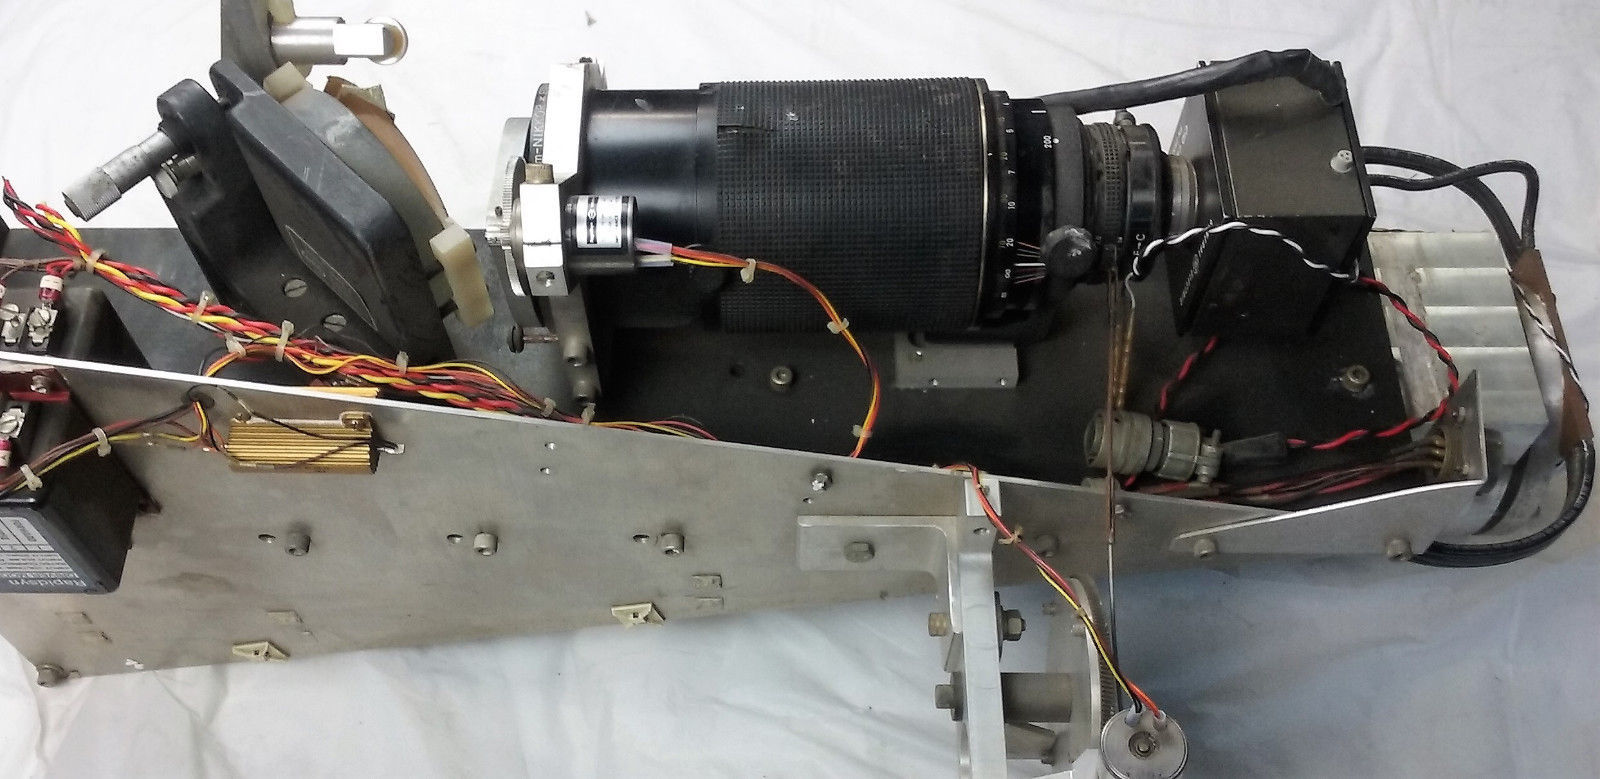 Newport Optical Mount 600A-4 Nikkor 80-200mm Lab Equipment Laser Photonics Lens image 5